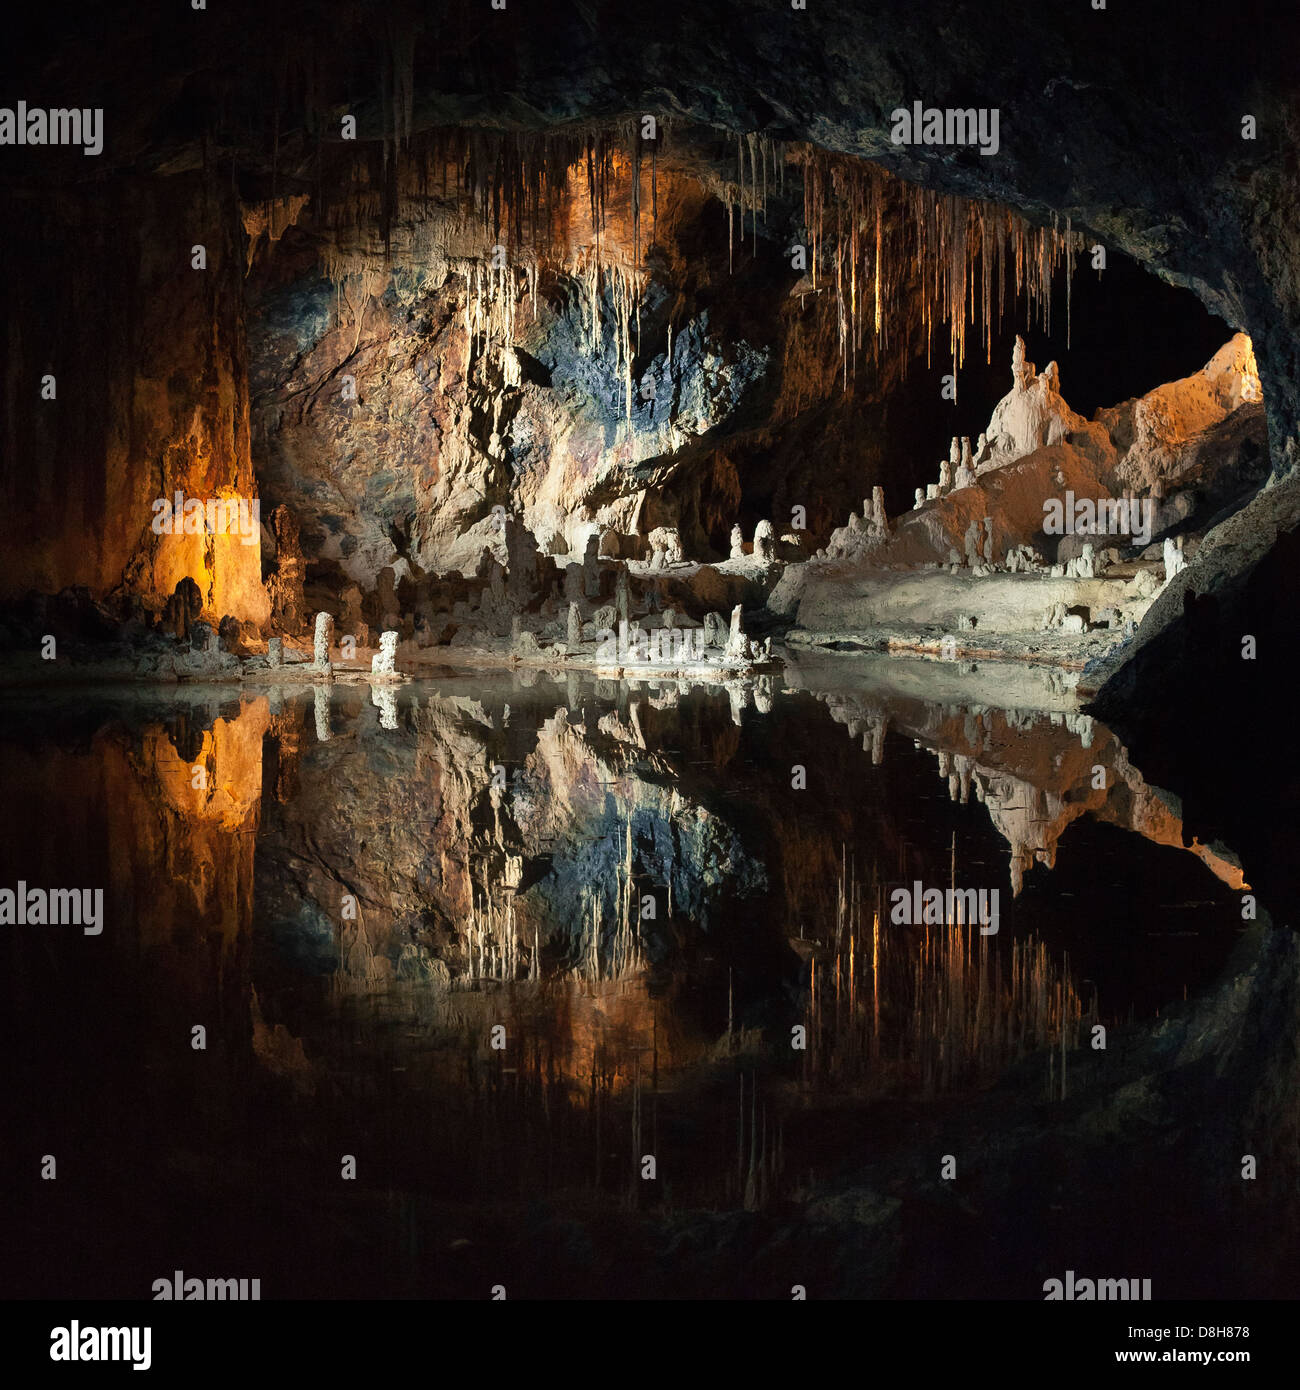 Saalfeld Fairy Grottoes. Saalfeld, Thuringia, Germany - Stock Image